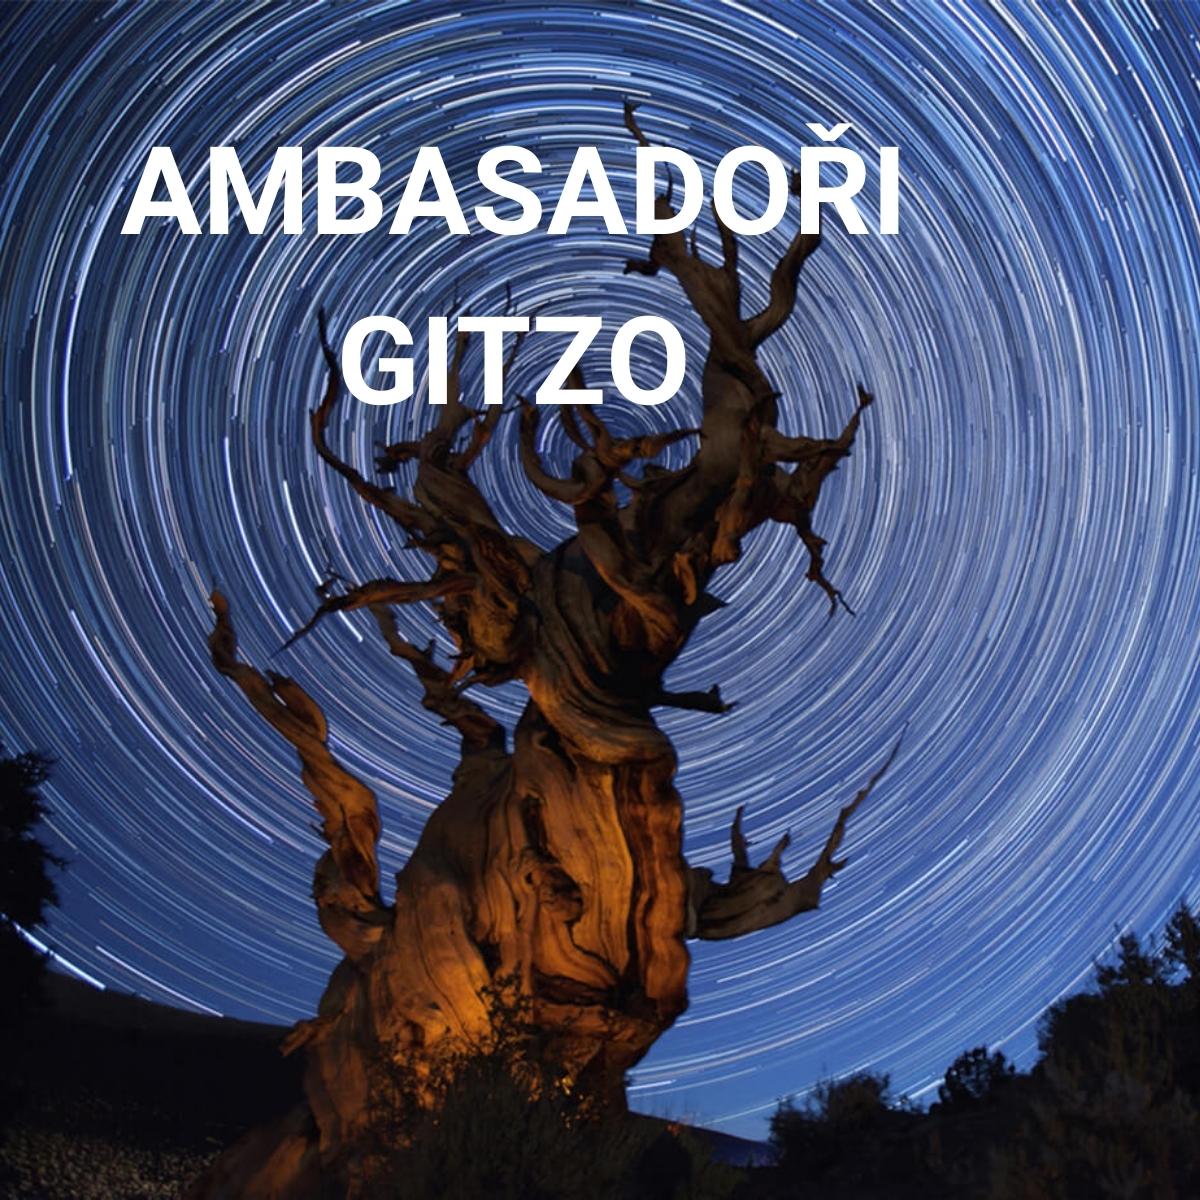 Ambasadoři Gitzo